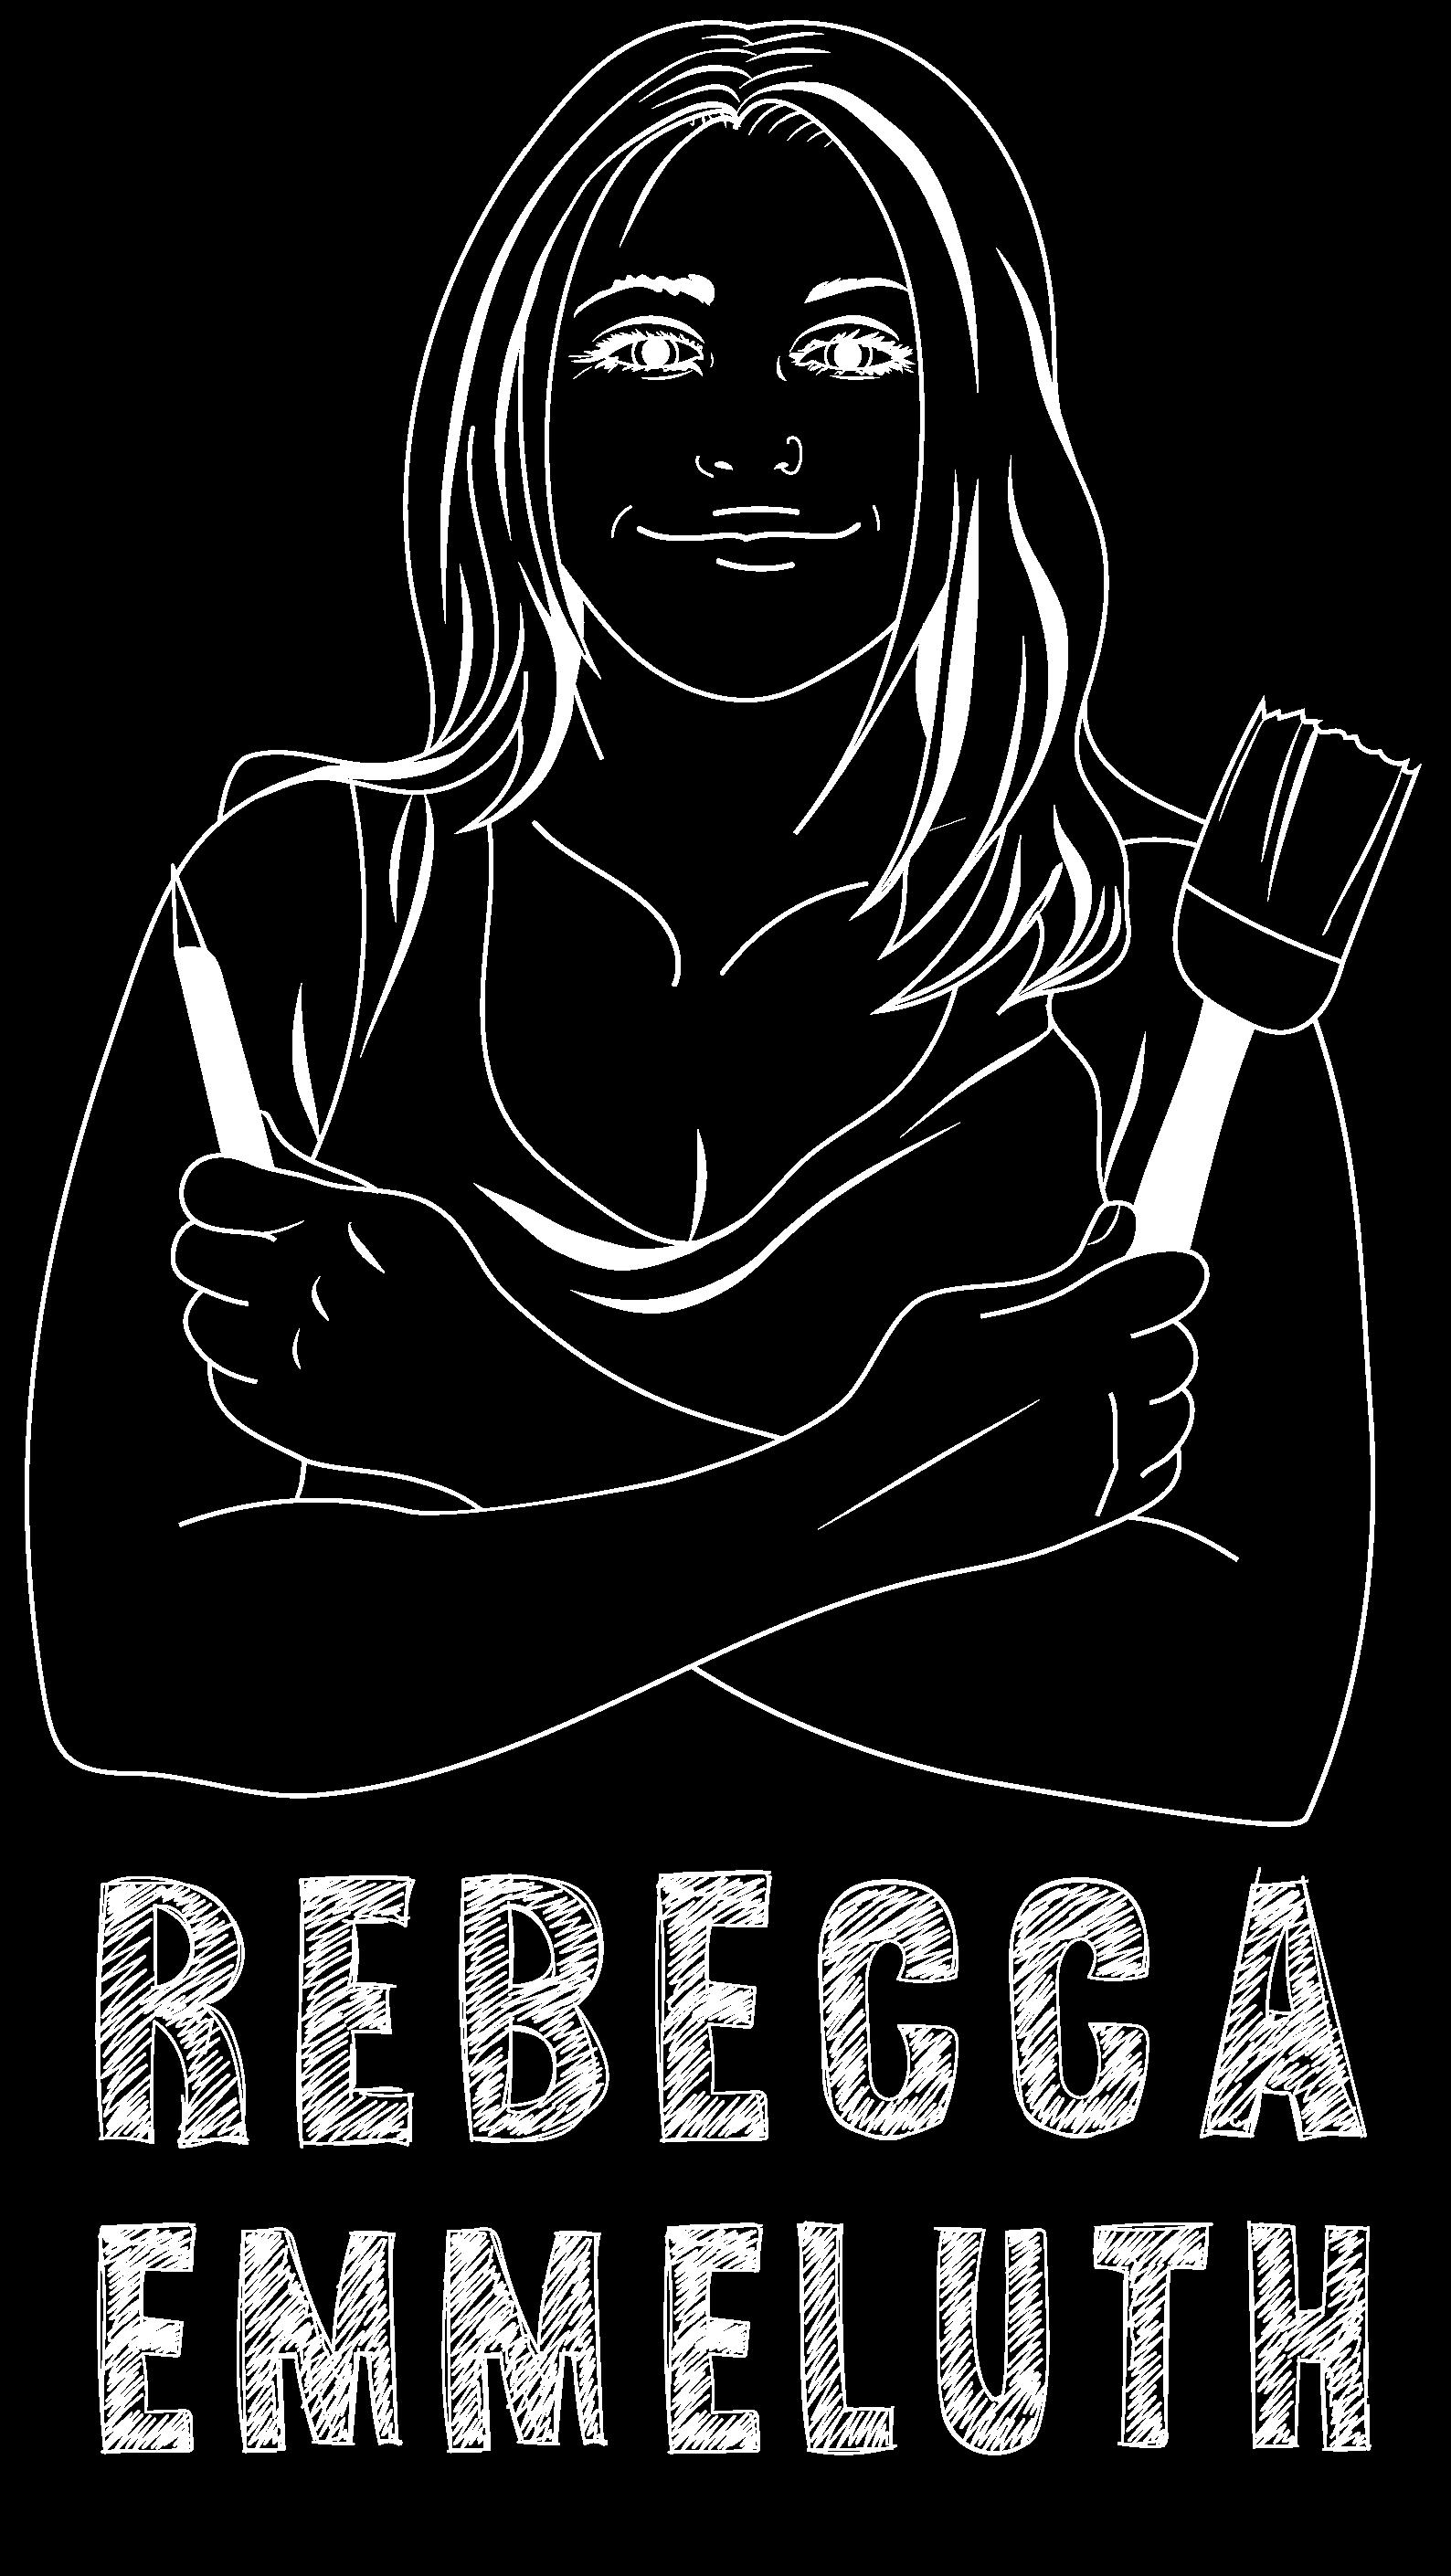 Rebecca Emmeluth